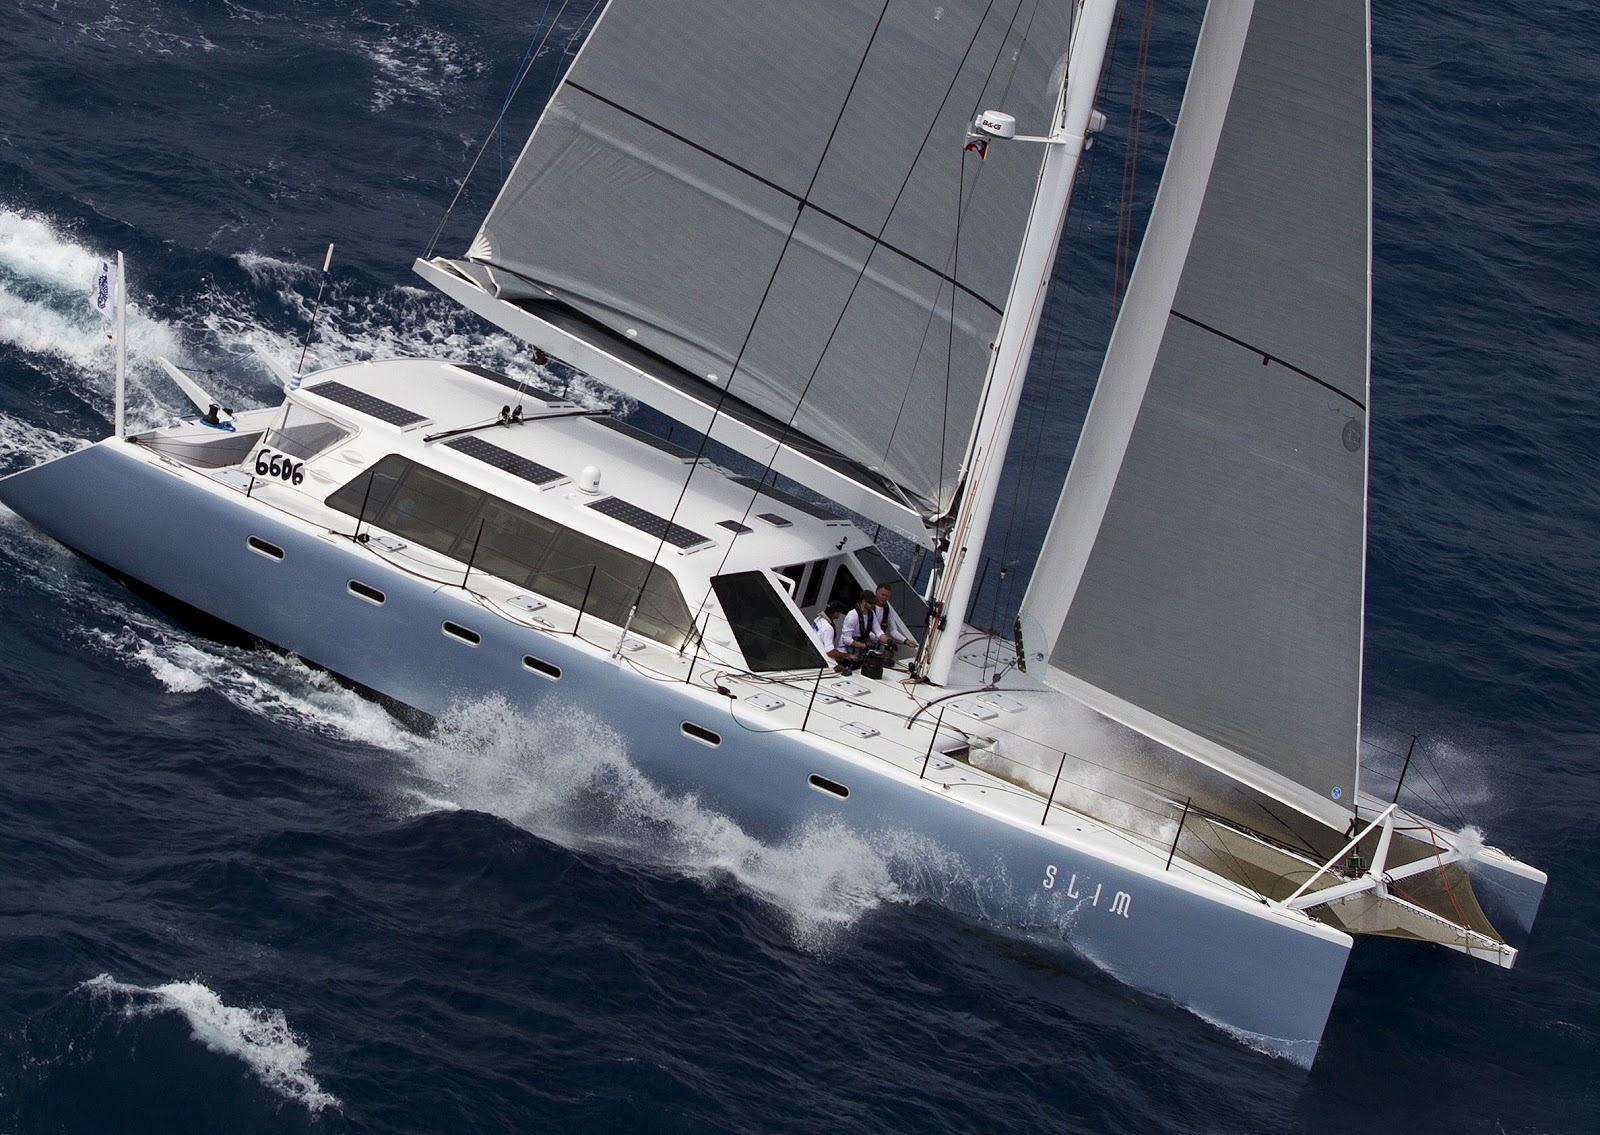 Sailing Profile Aerial View